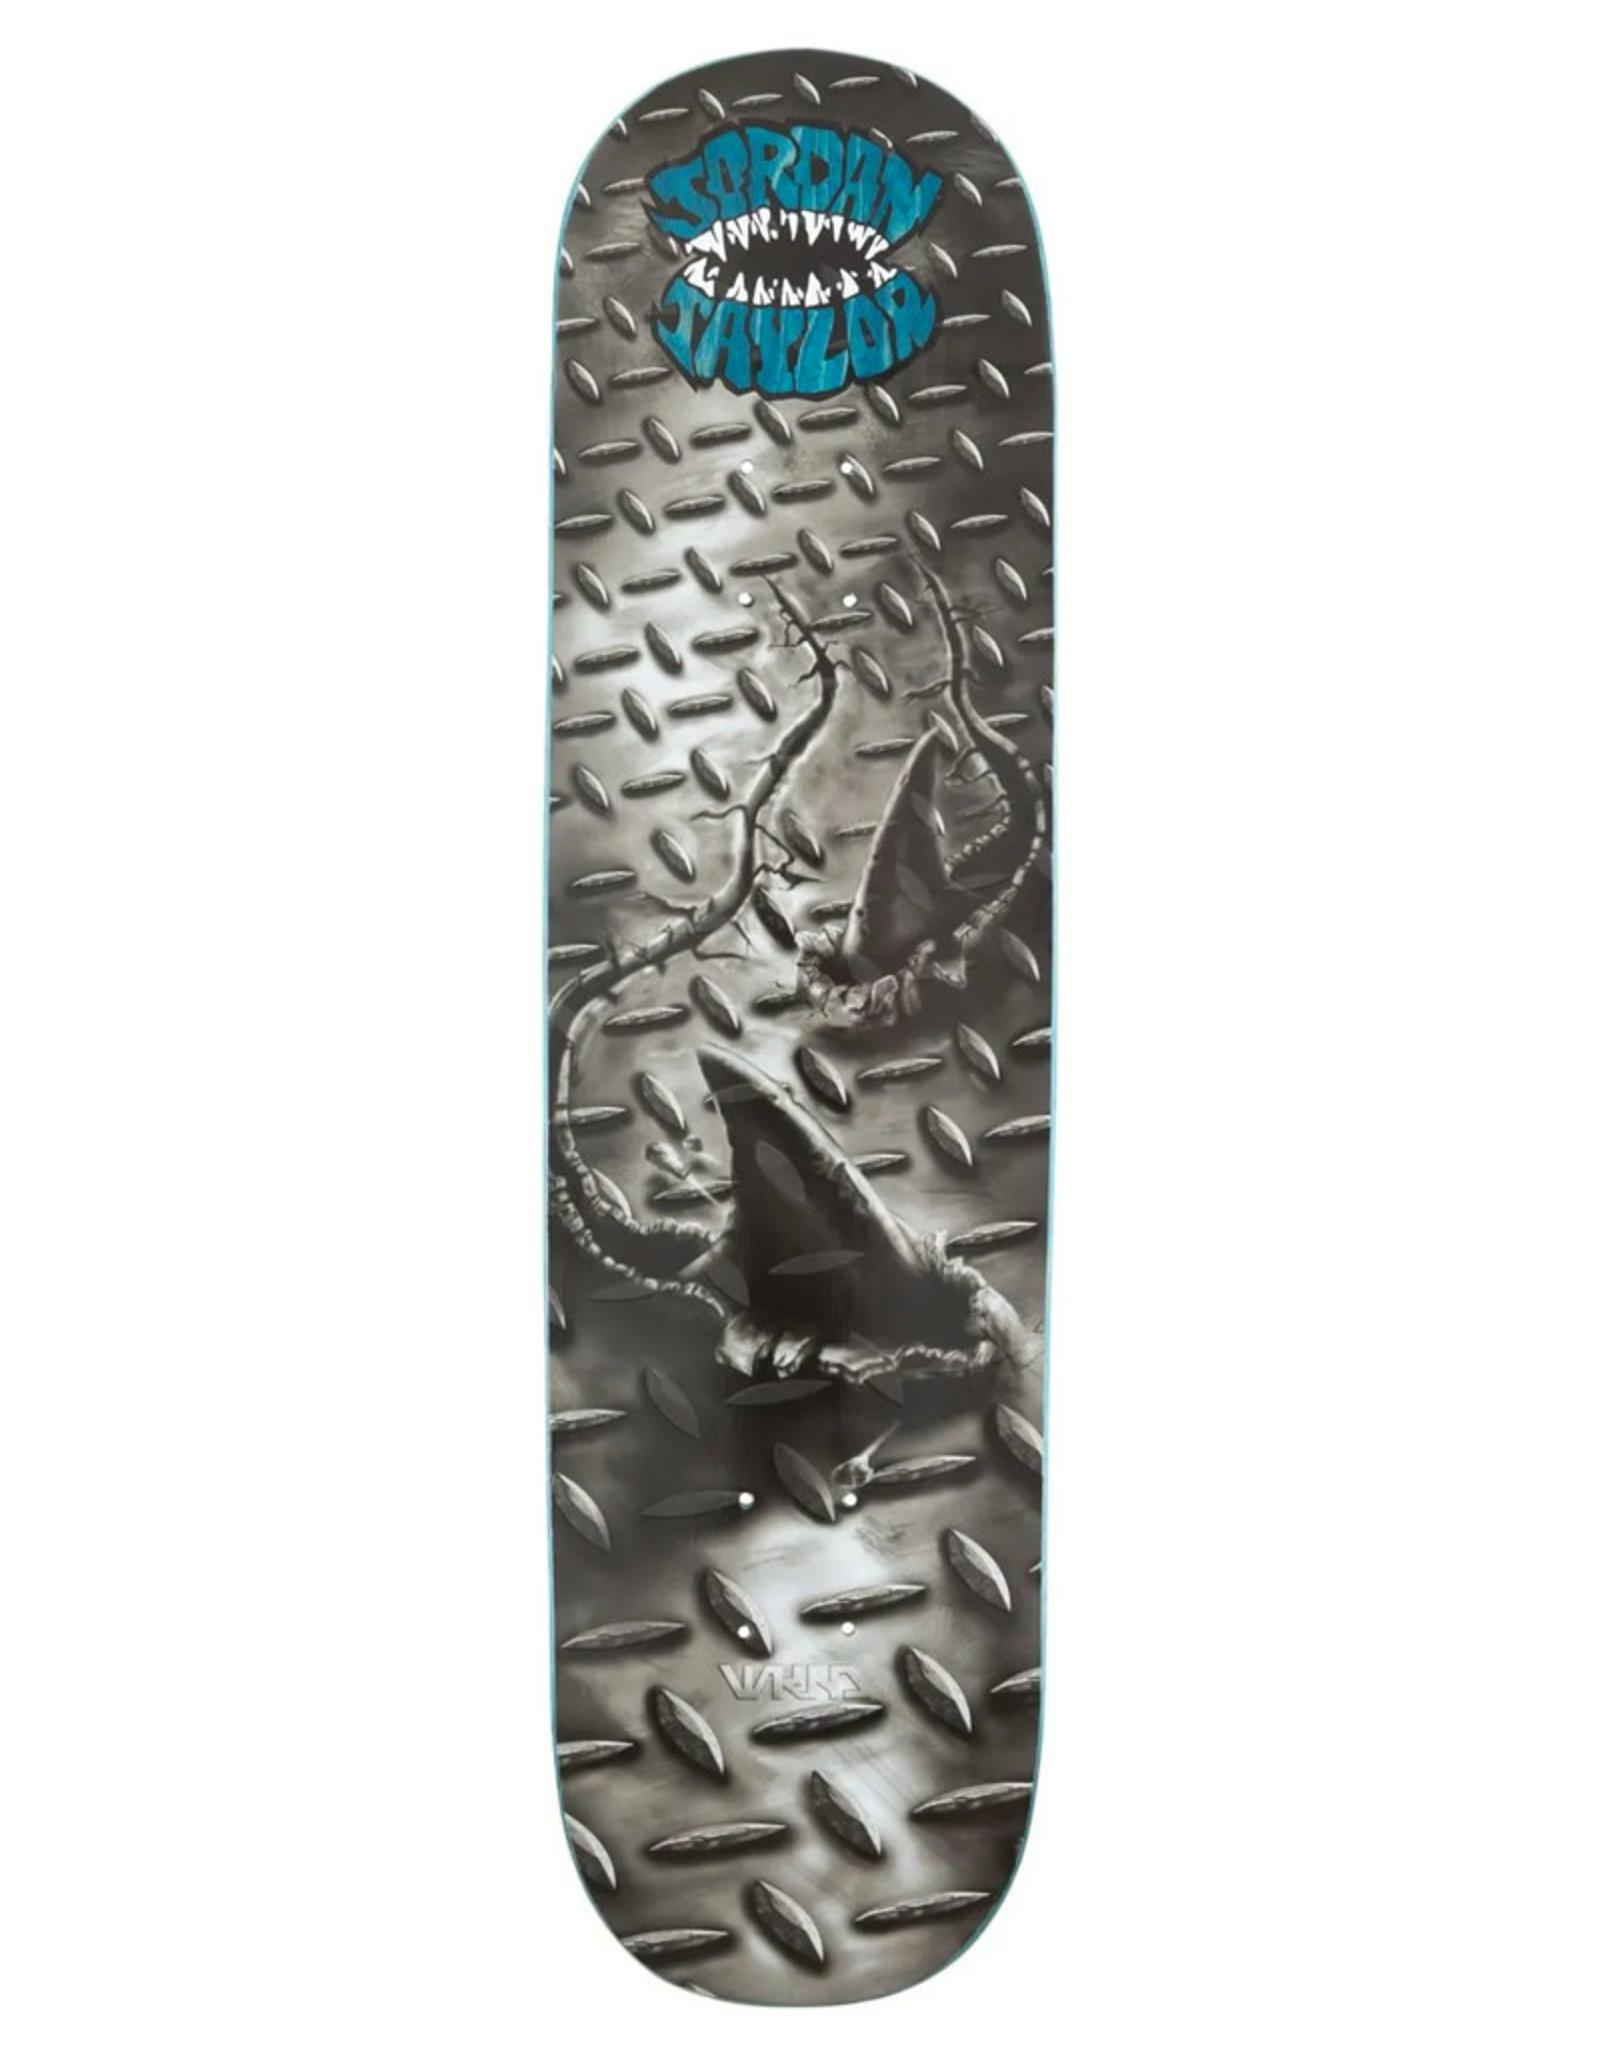 Wknd Skateboards Wknd Deck Jordan Taylor Street Shark (8.25)